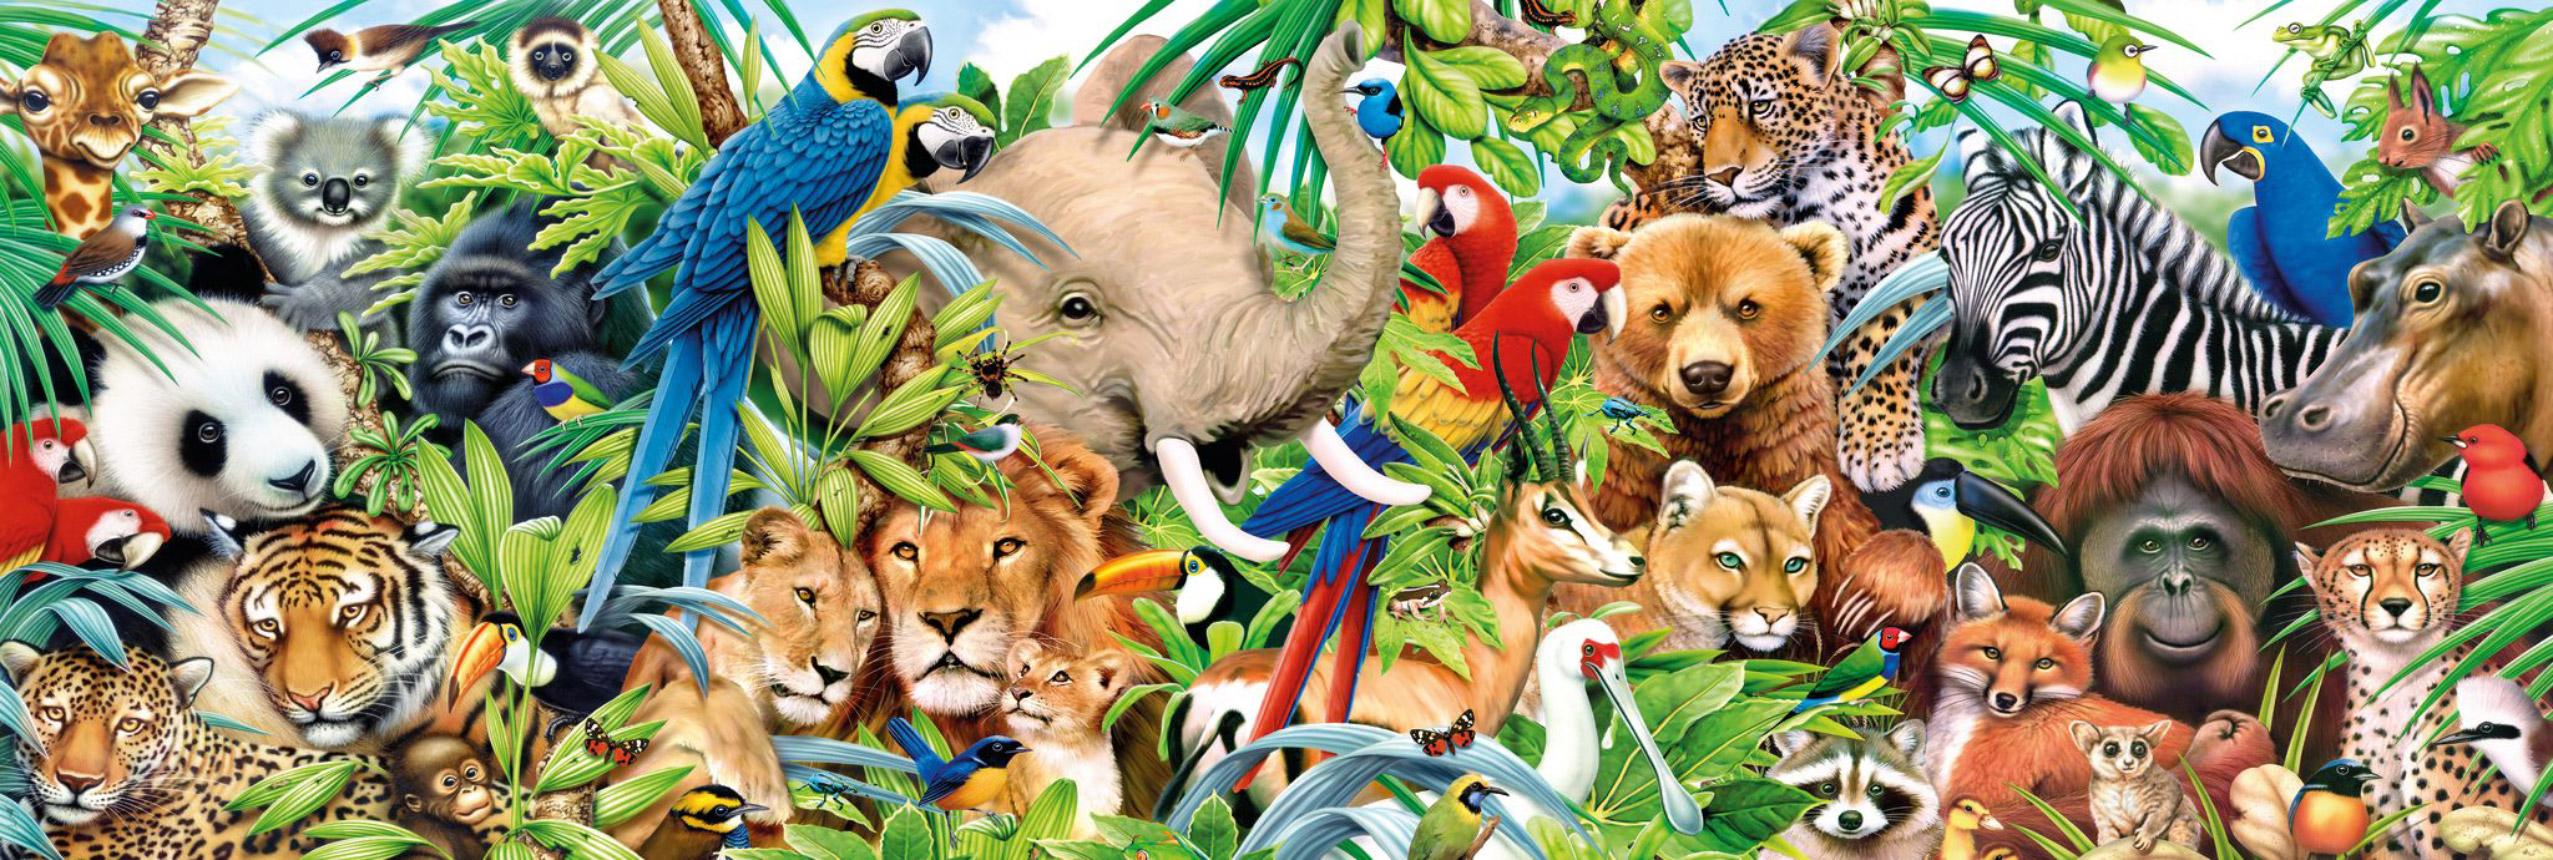 Wildlife Animals Jigsaw Puzzle